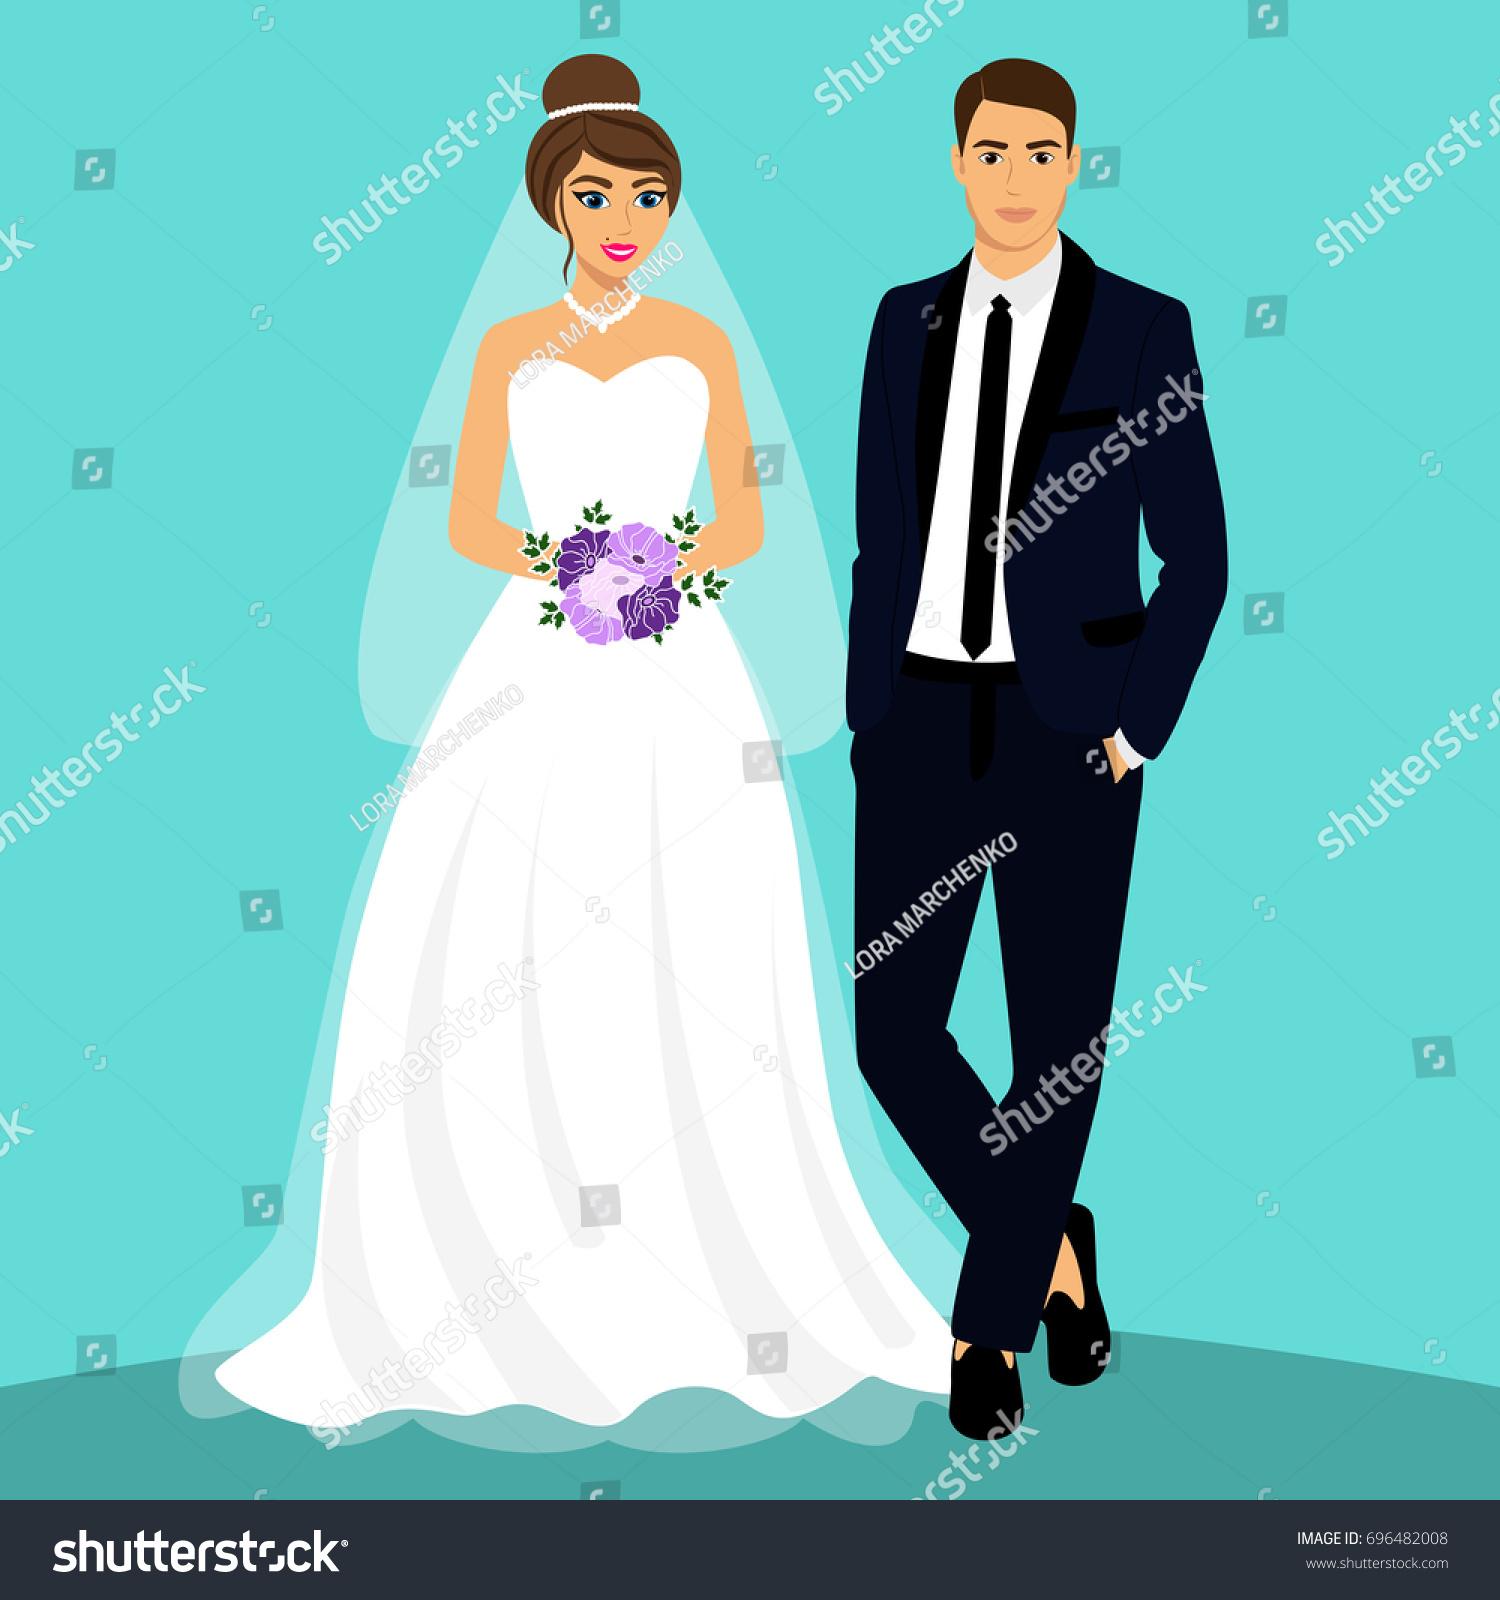 Bride Groom Couple Wedding Card Newlyweds Stock Vector 696482008 ...